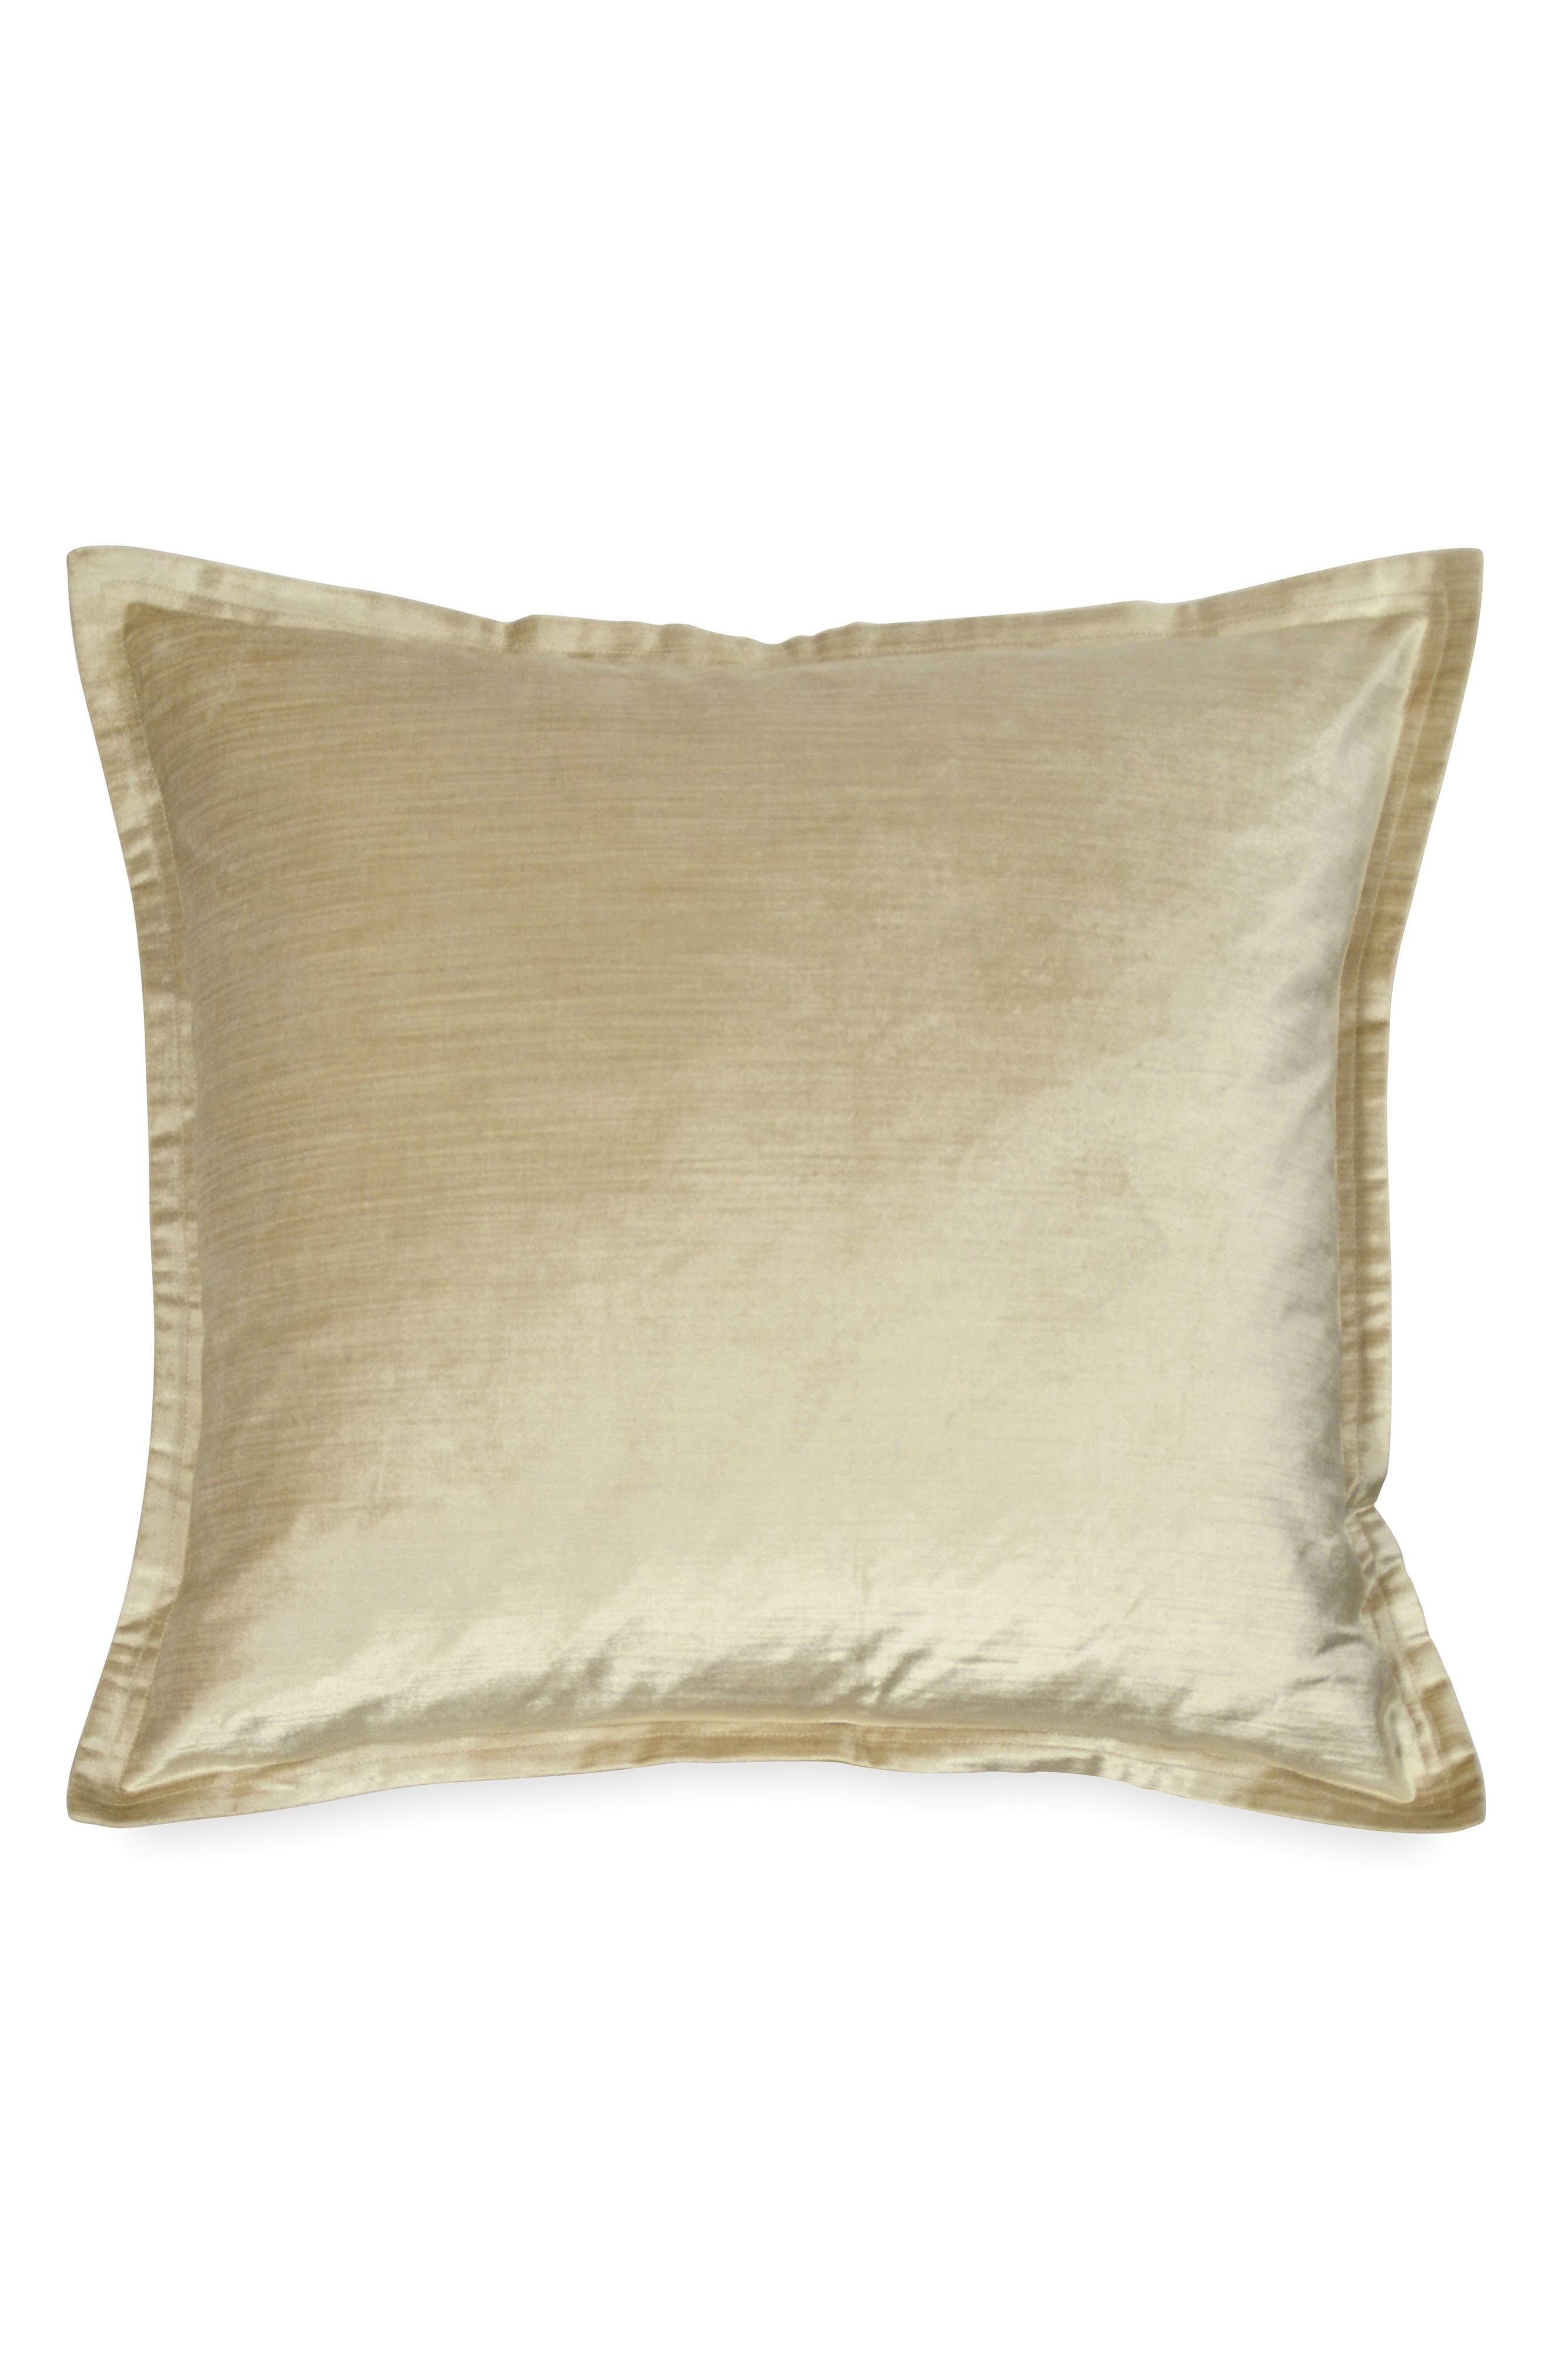 DONNA KARAN NEW YORK Donna Karan Velvet Accent Pillow, Main, color, GOLD DUST